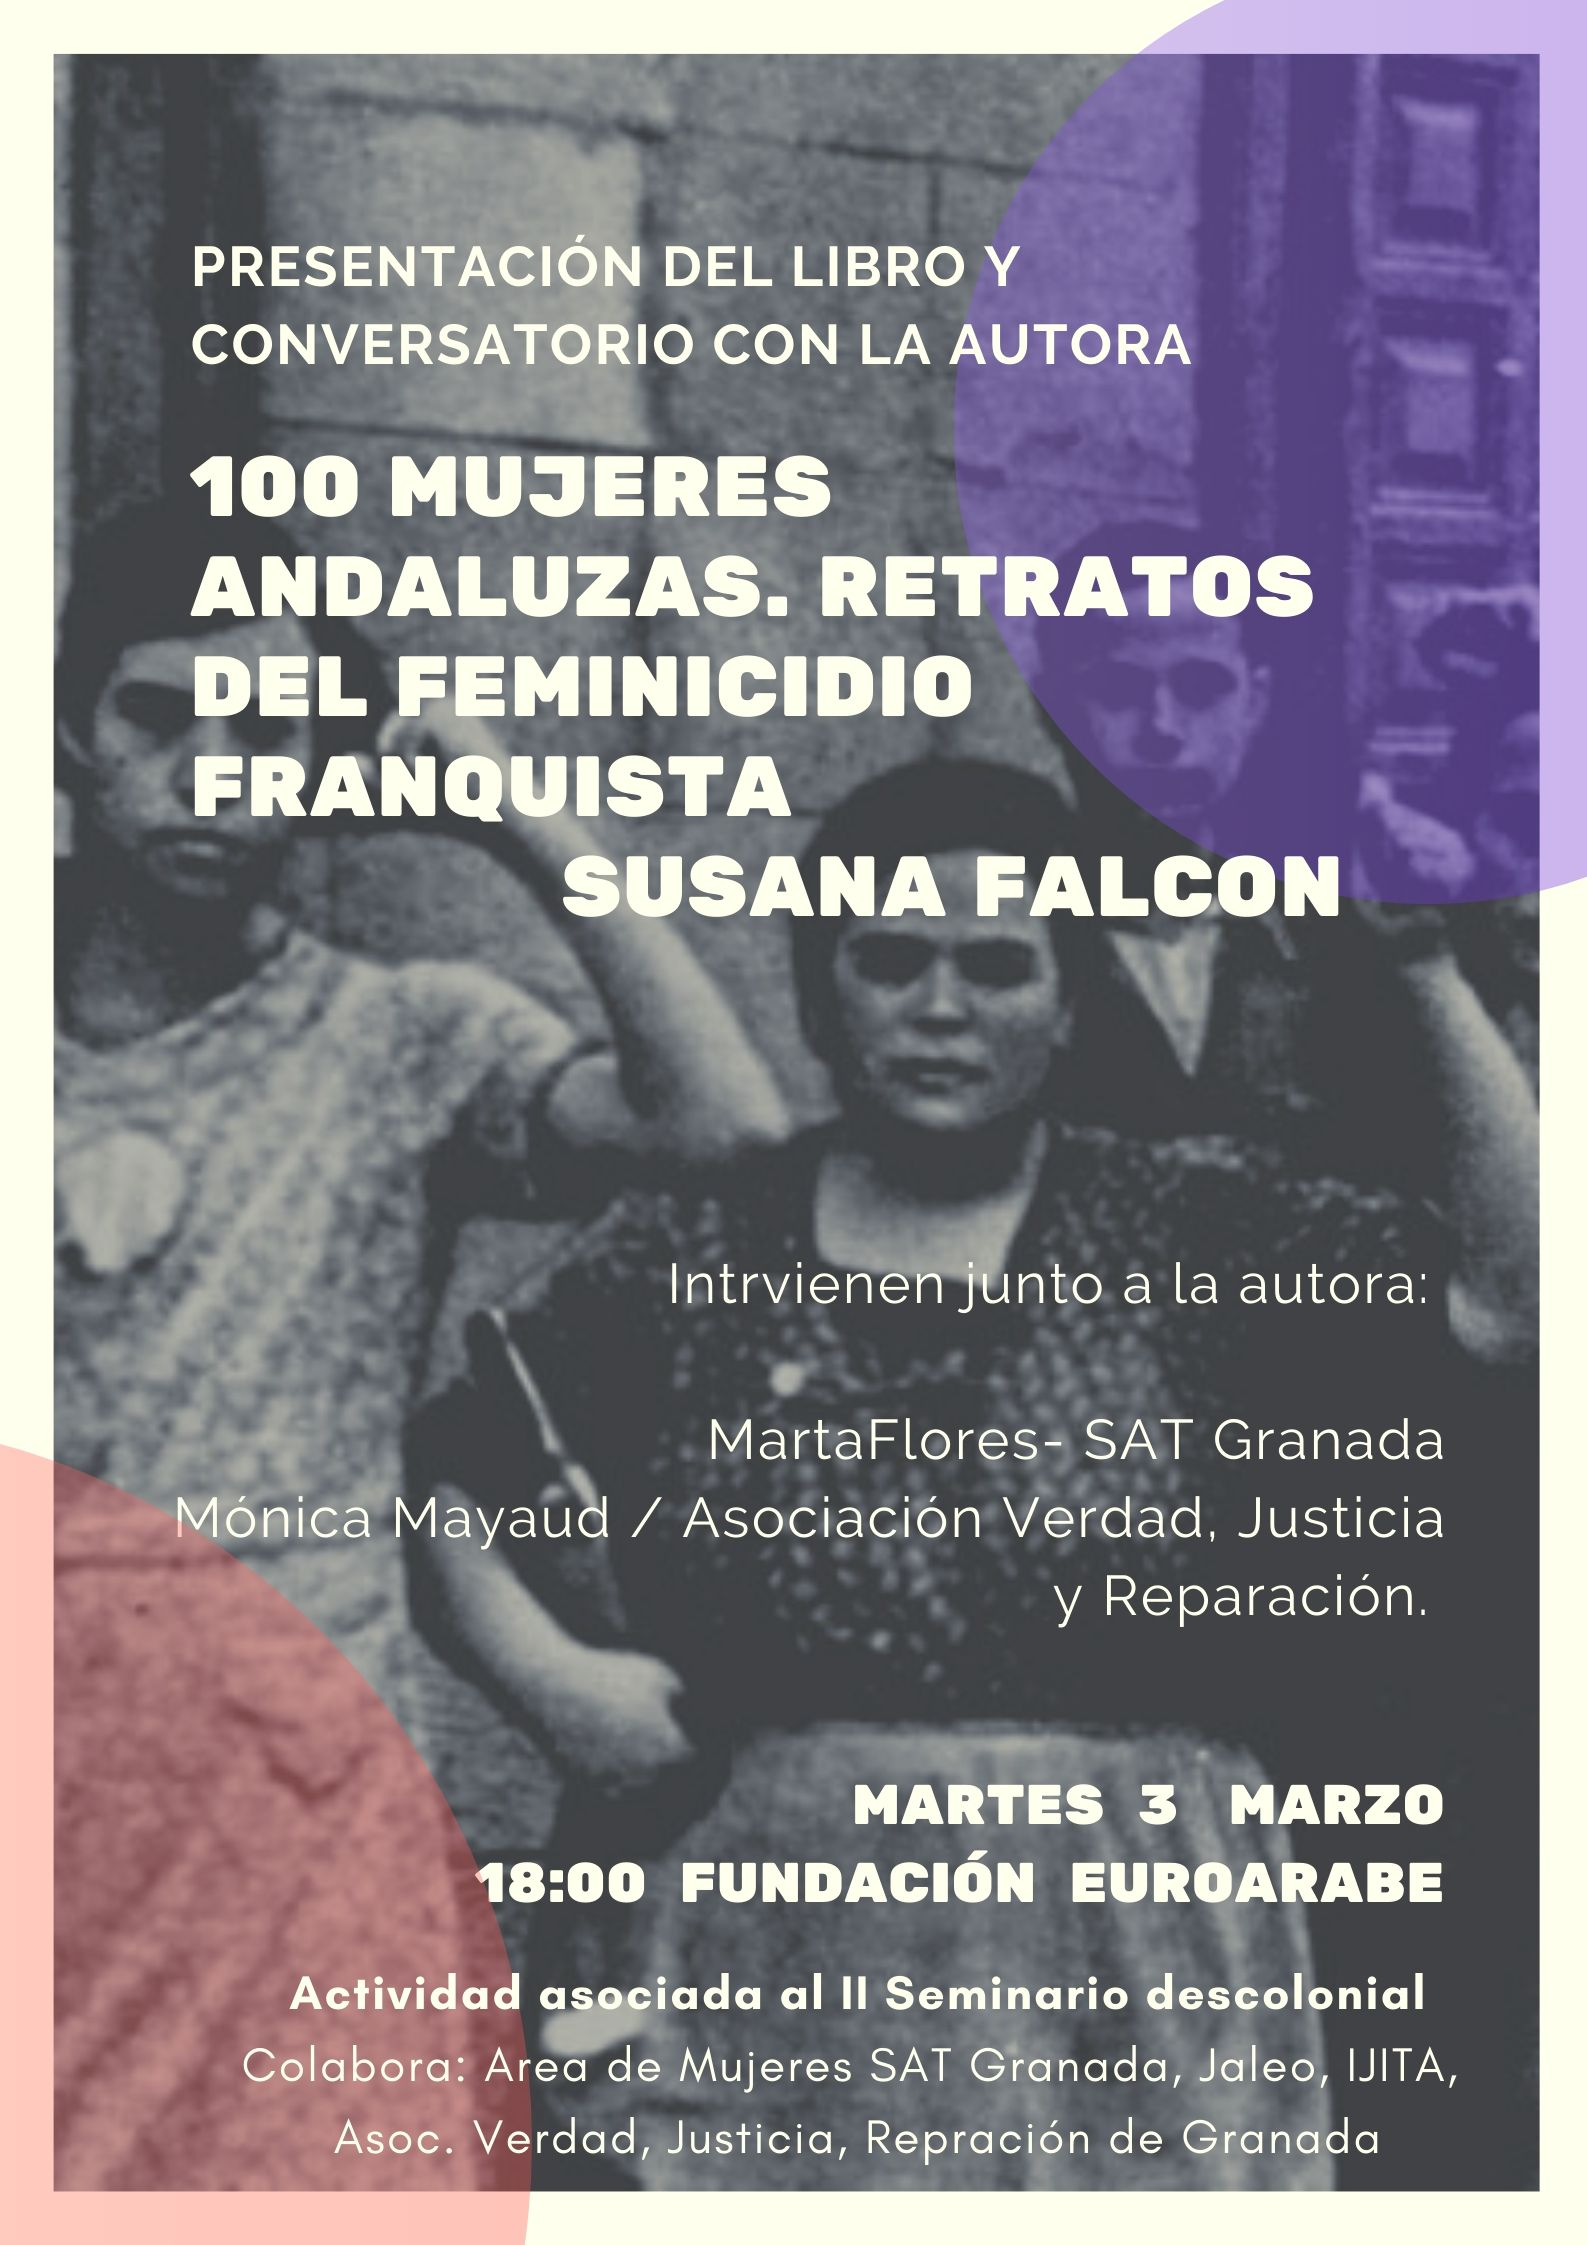 100 Mujeres Andaluzas. Retratos del feminicidio franquista-2